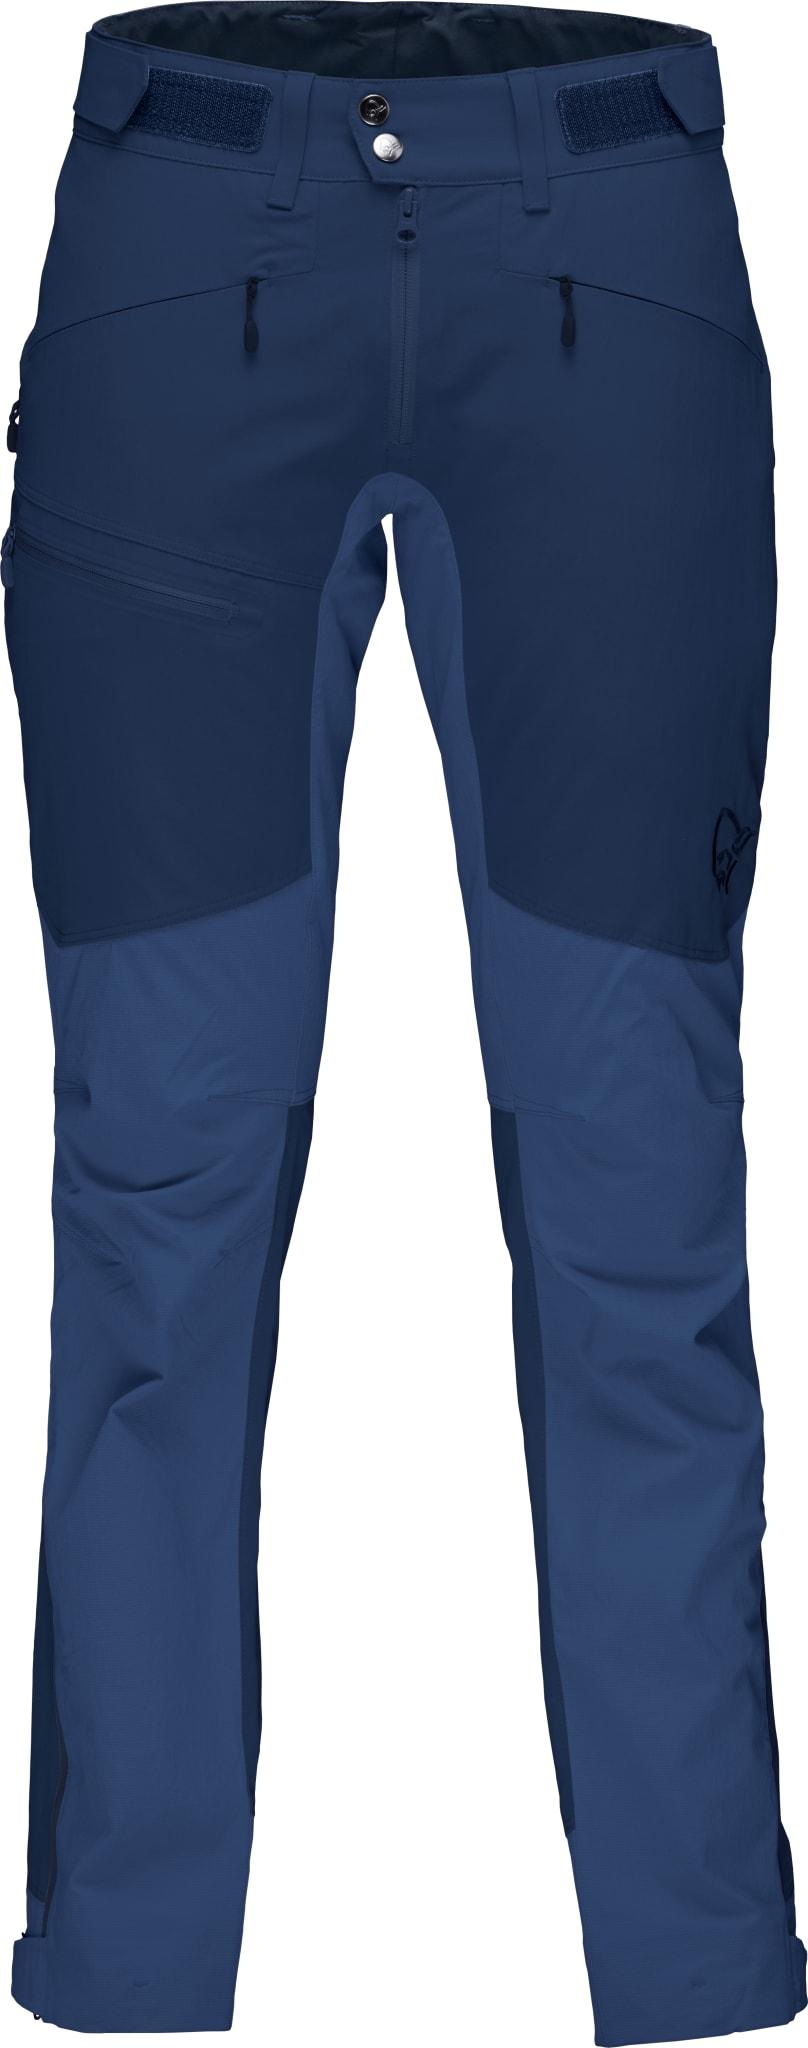 Falketind Flex1 Heavy Duty Pants W